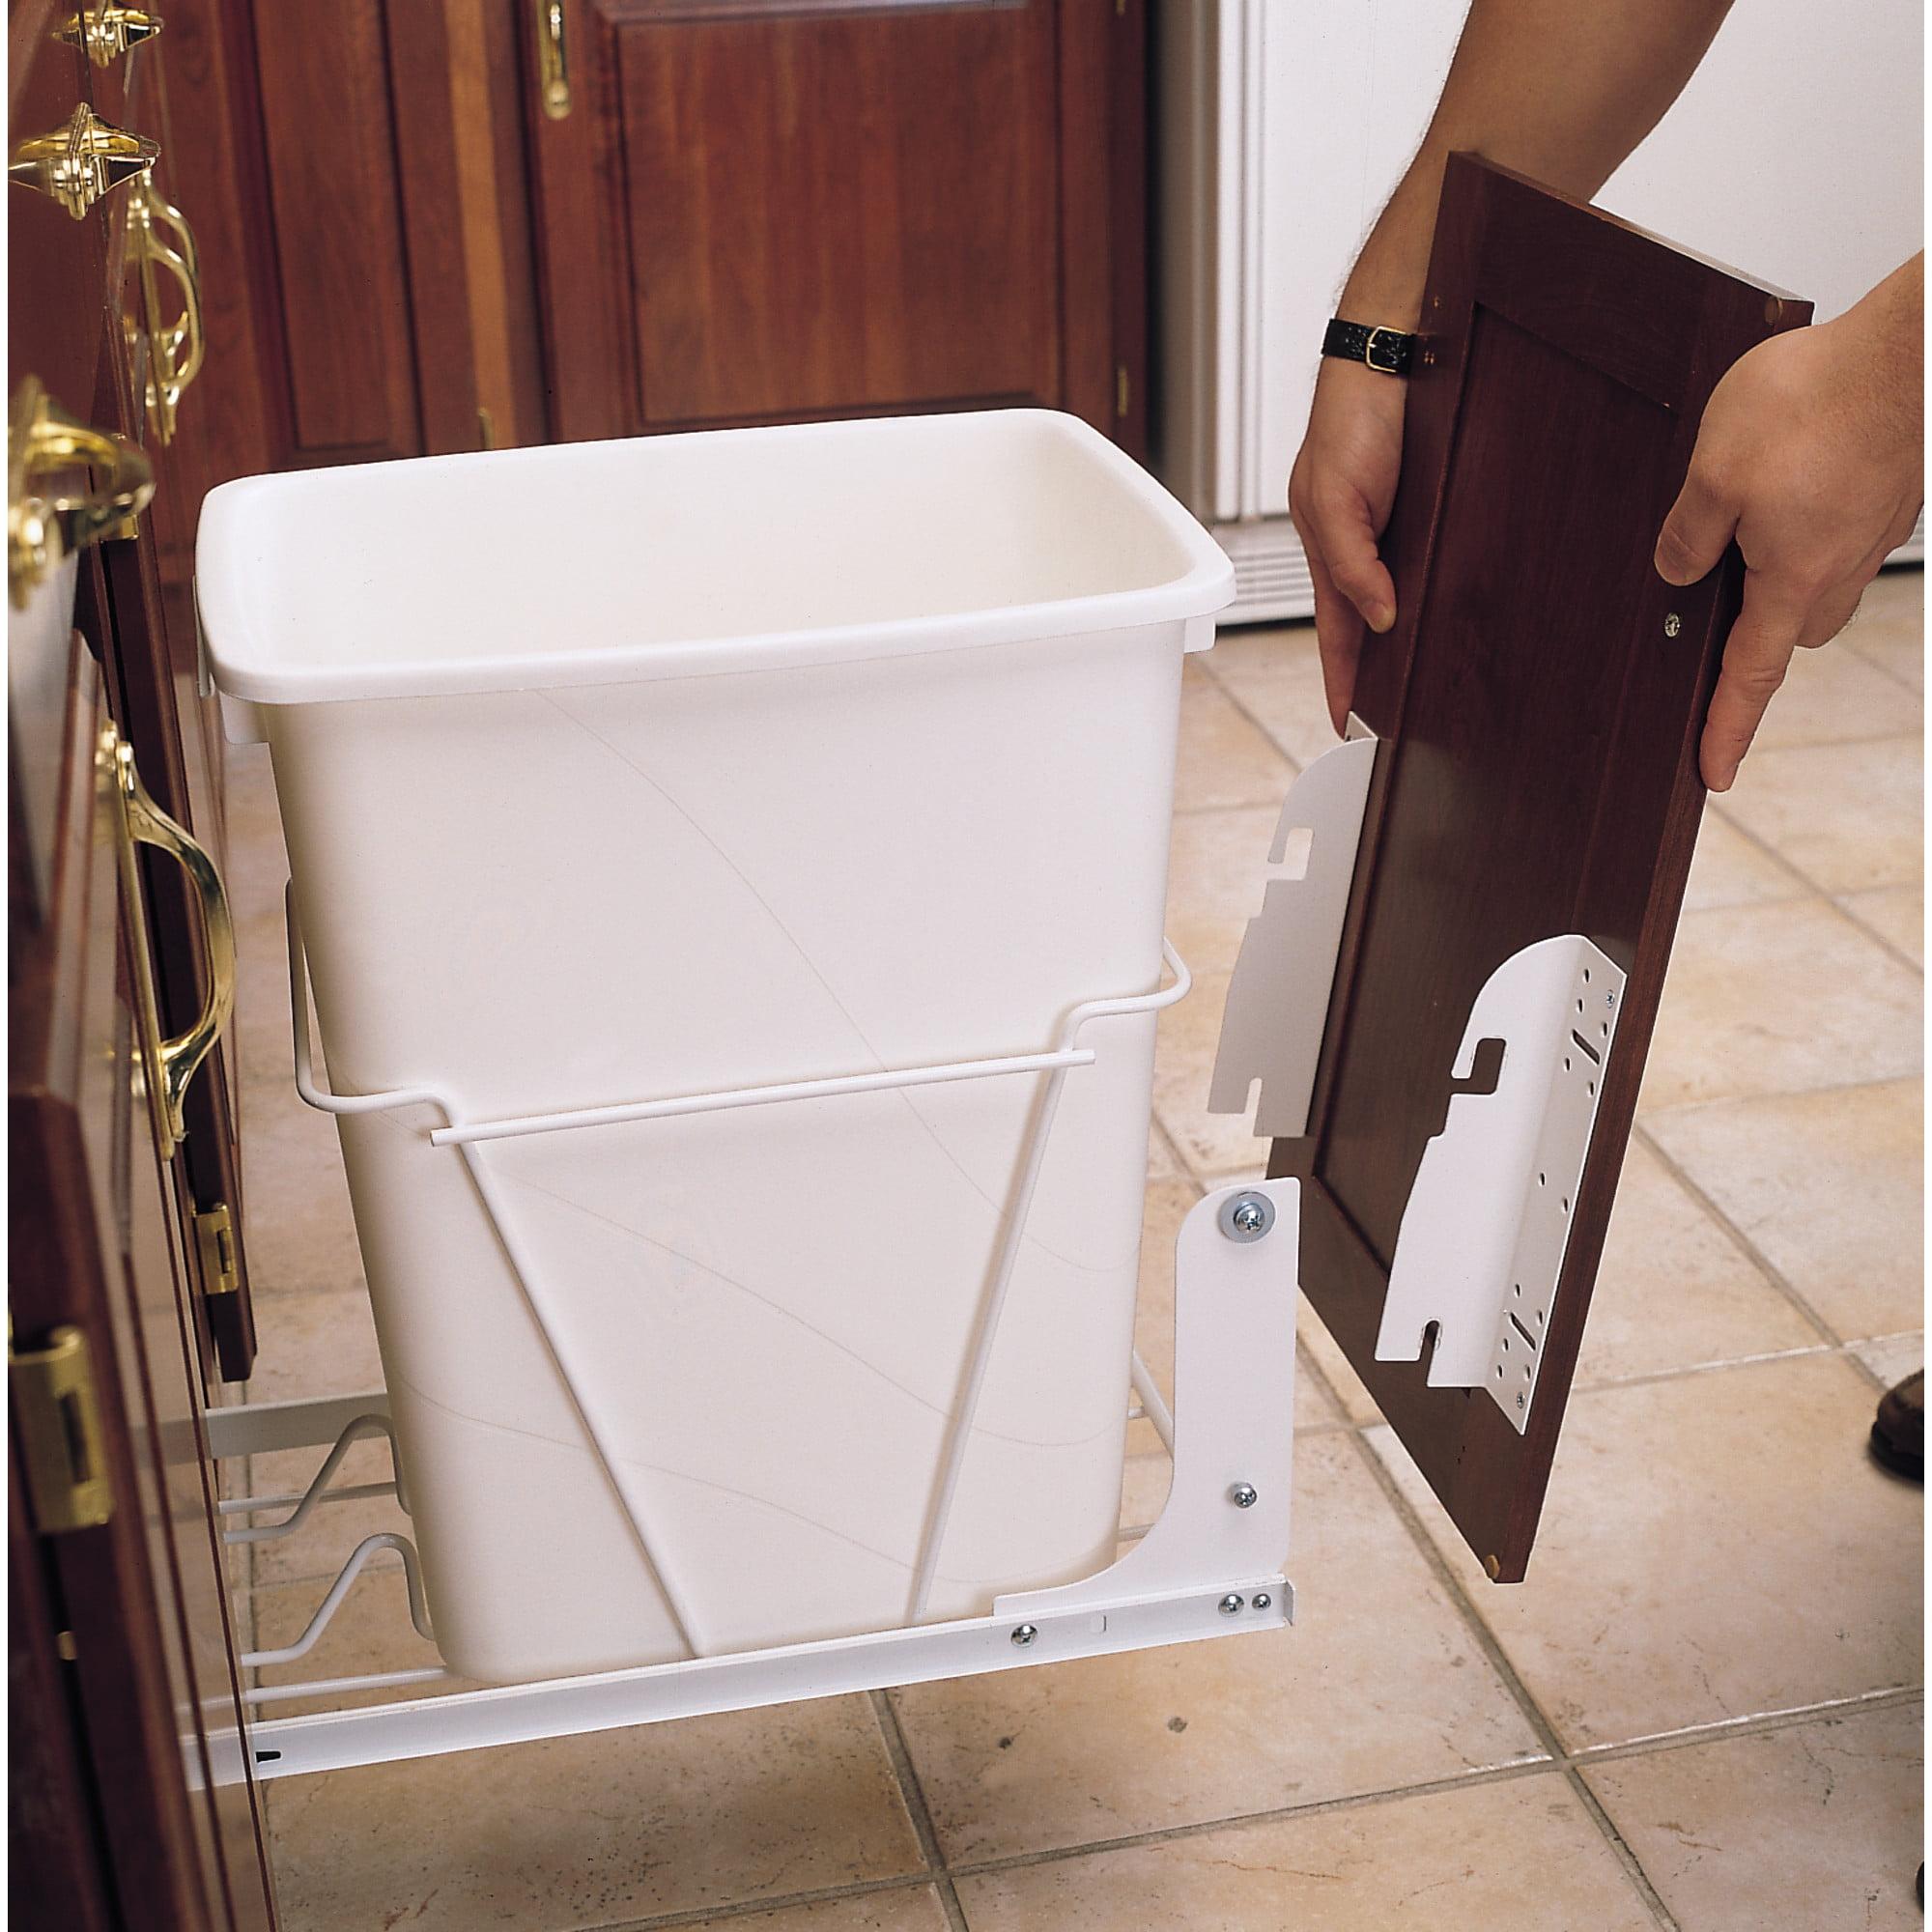 Rev-A-Shelf Door Mount Kit For Rv Series White PartNo RV DM KIT by Rev-A-Shelf